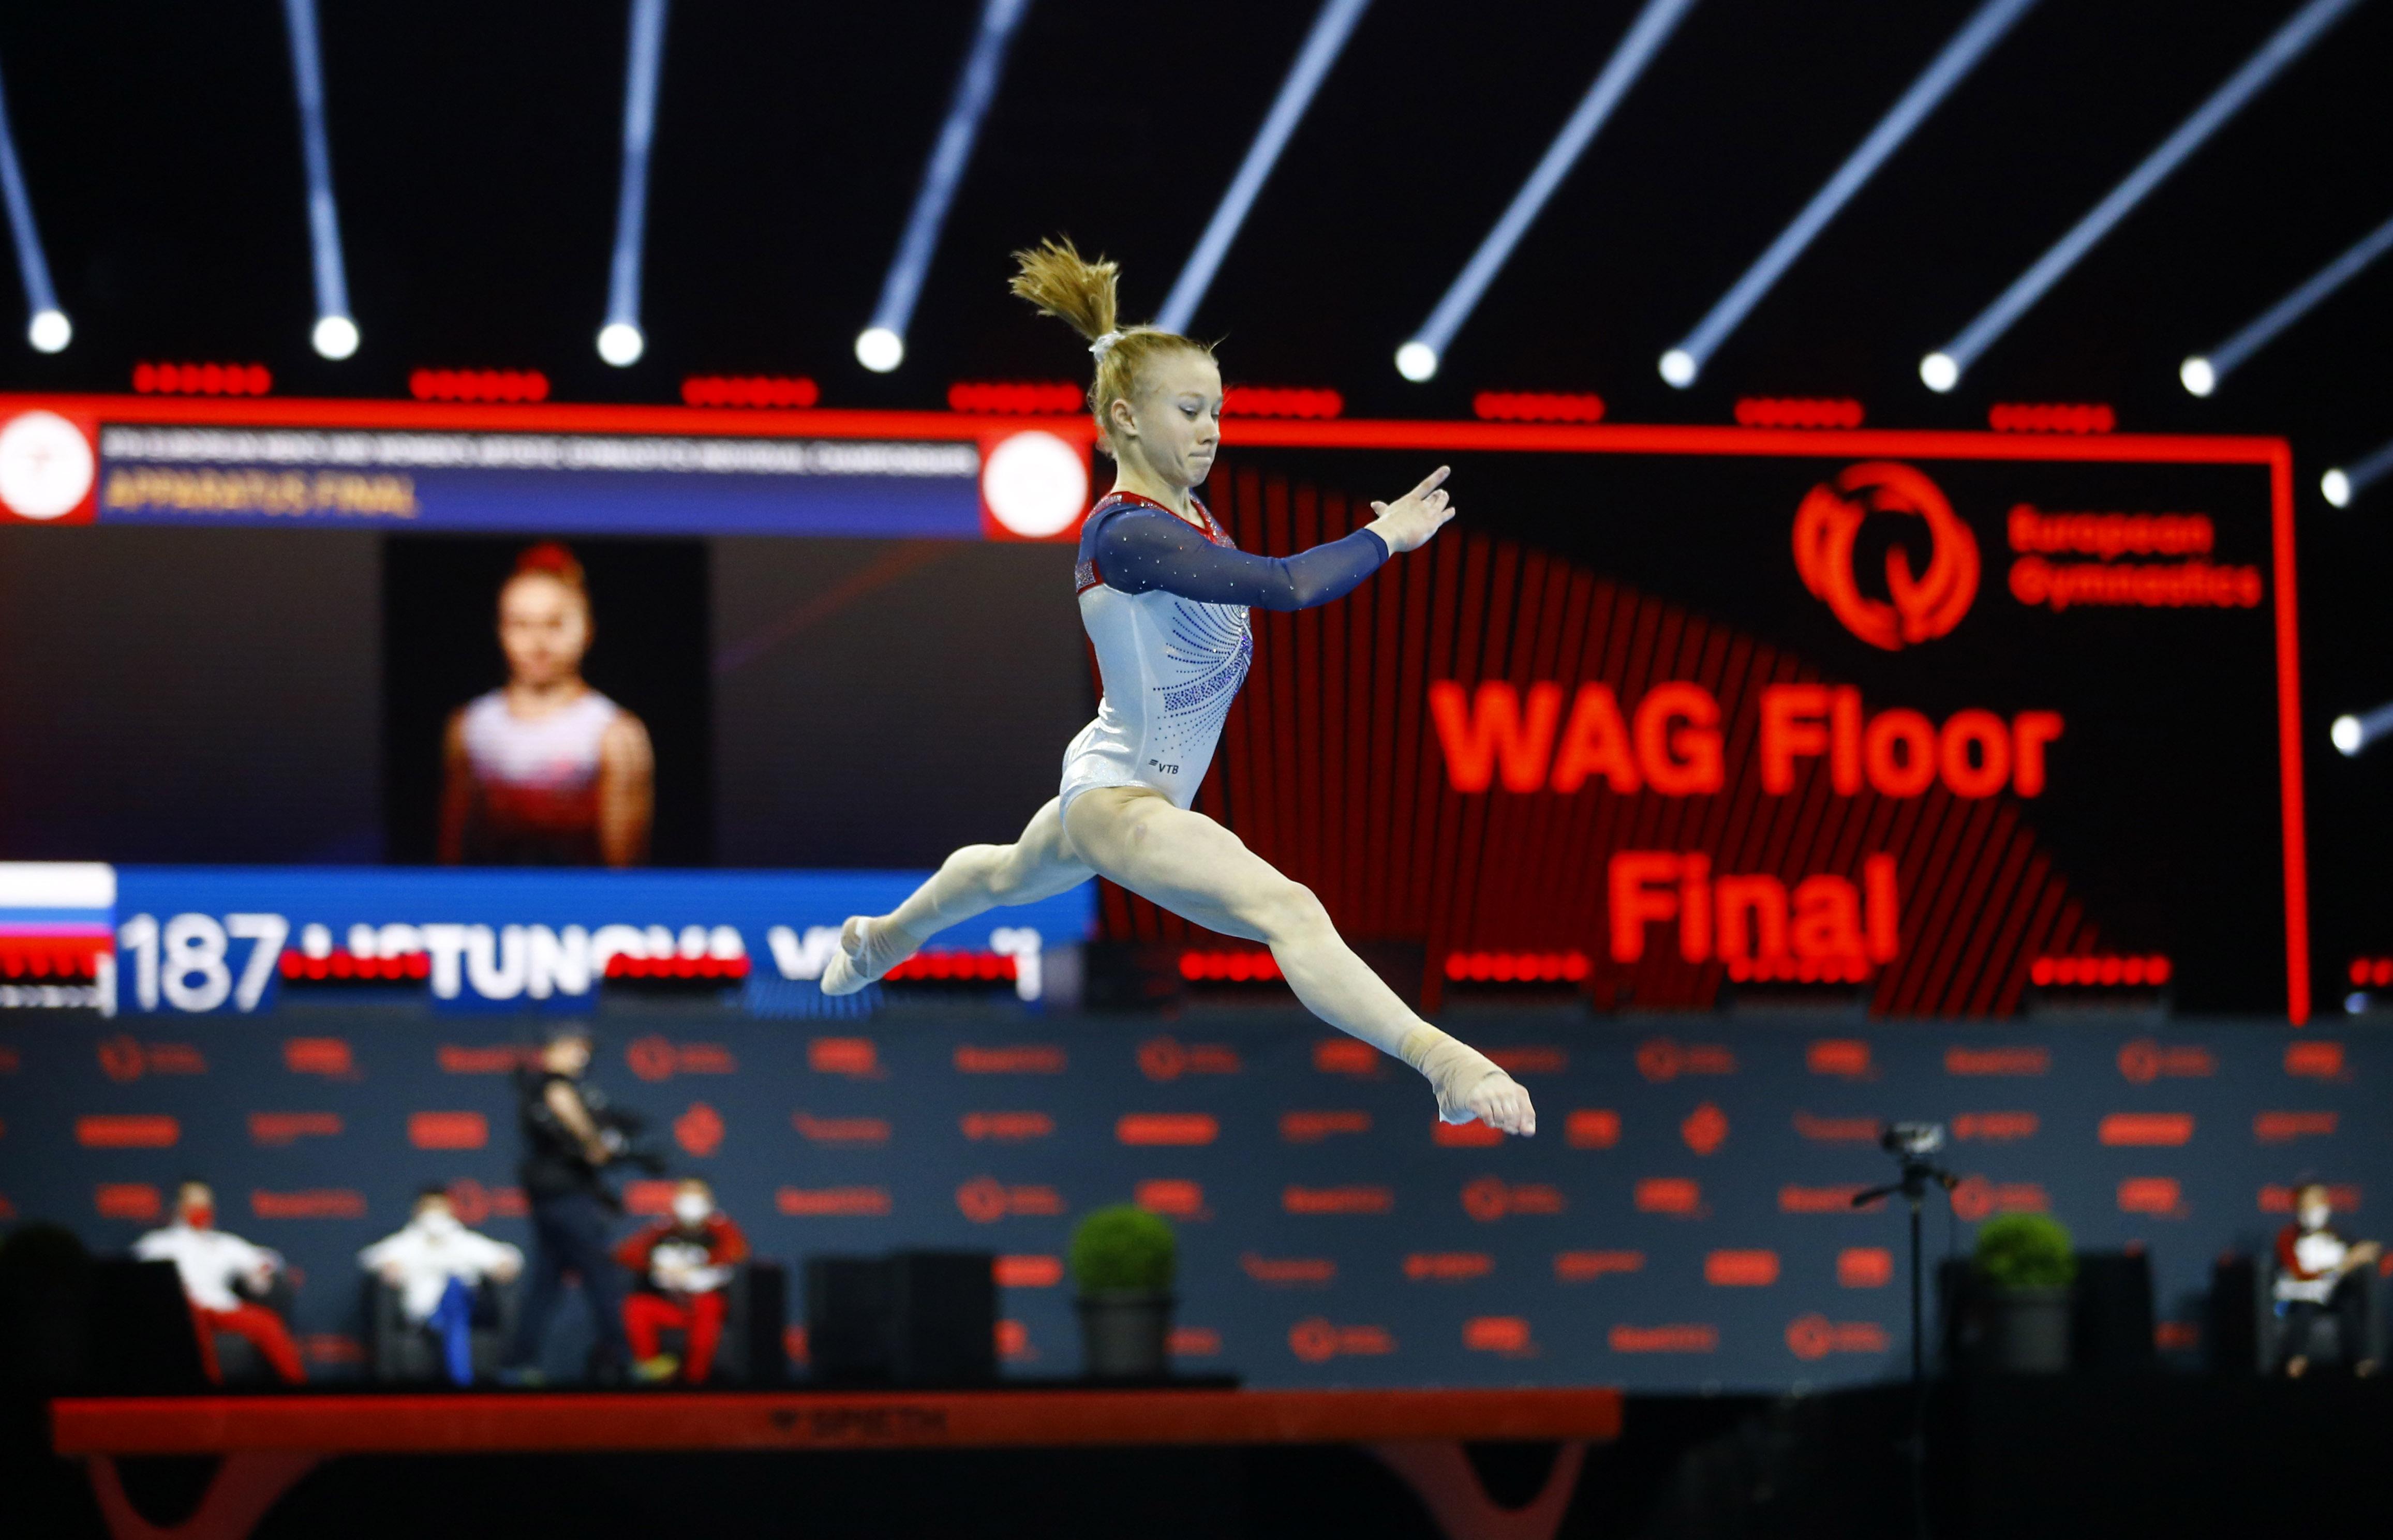 Gymnastics - 2021 European Artistic Gymnastics Championships - St. Jakobshalle, Basel, Switzerland - April 25, 2021 Russia's Viktoria Listunova in action during the women's all-round floor REUTERS/Arnd Wiegmann/File Photo